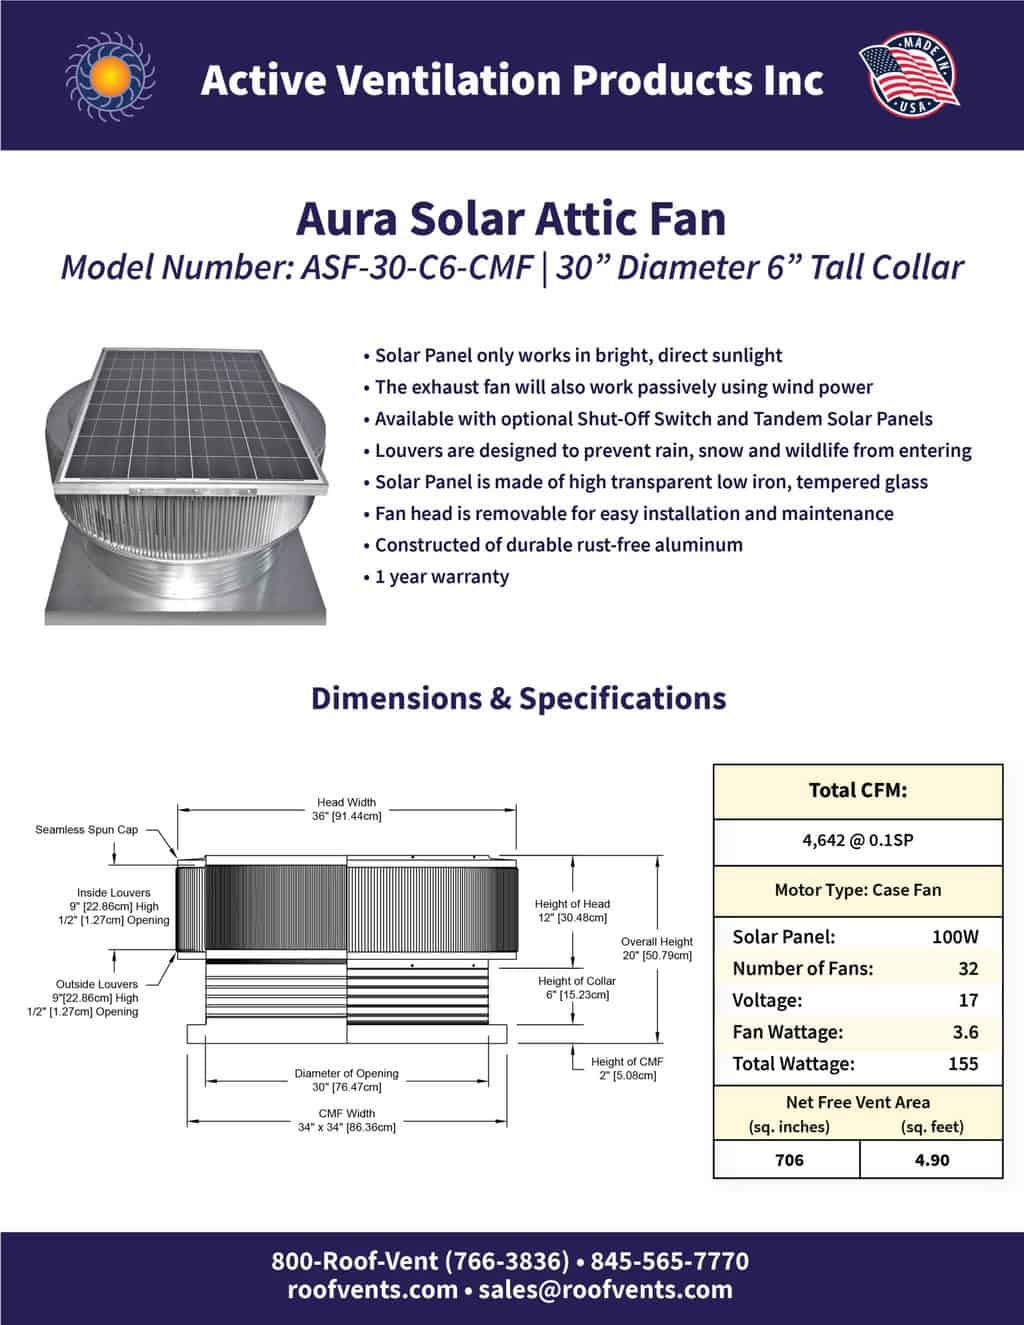 ASF-30-C6-CMF-brochure